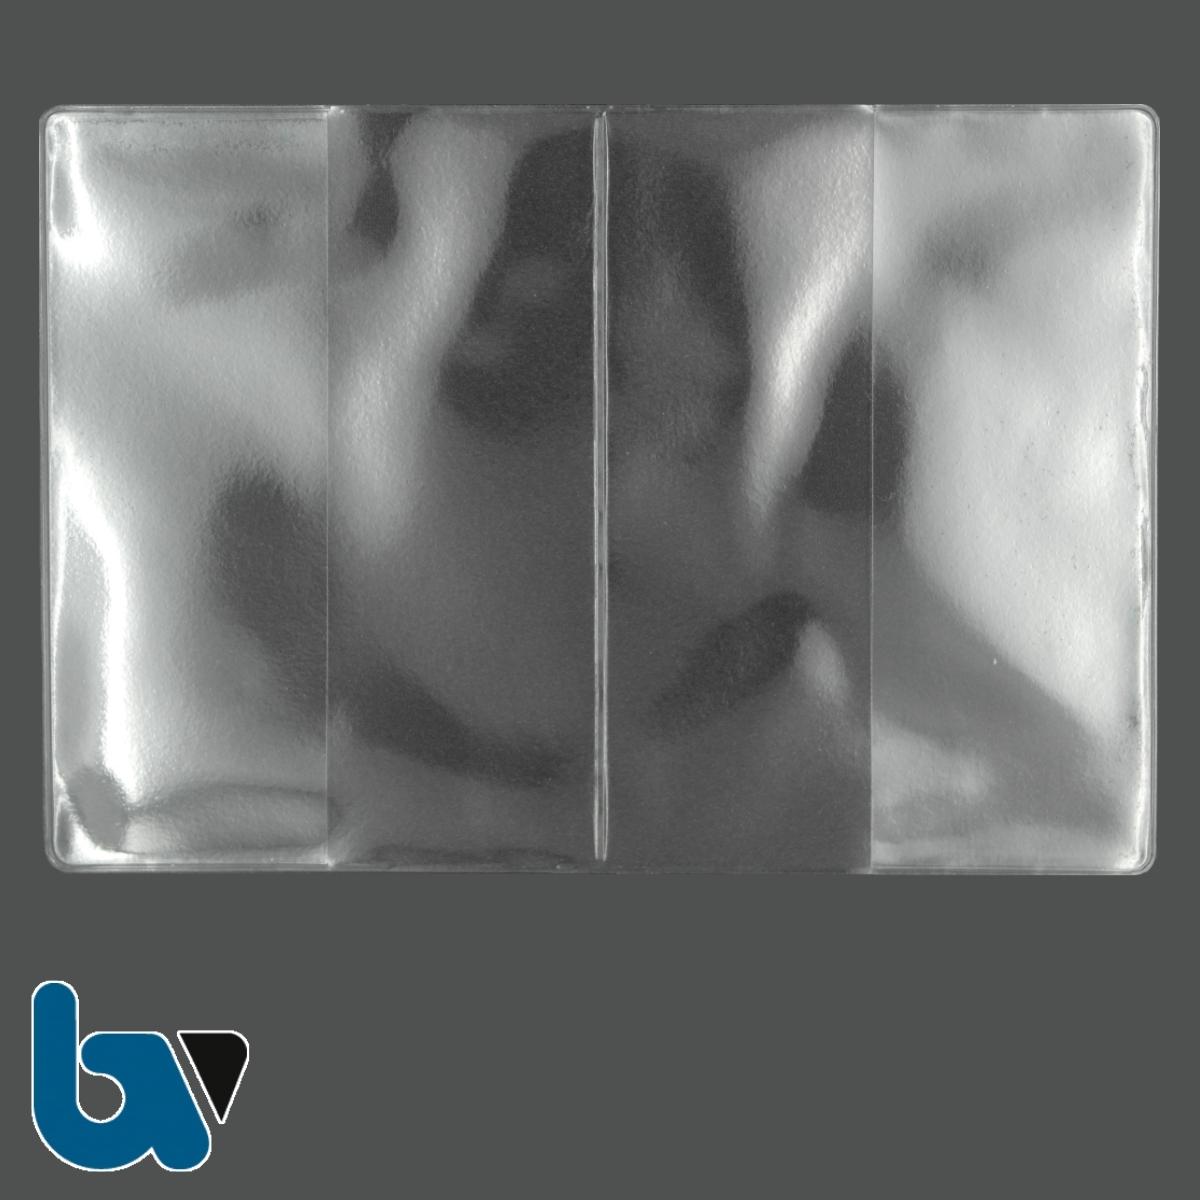 0-519-37 Schutzhülle Sichthülle Doppelhülle elektronisch Reisepass Einstecklasche Dokument Ausweis | Borgard Verlag GmbH